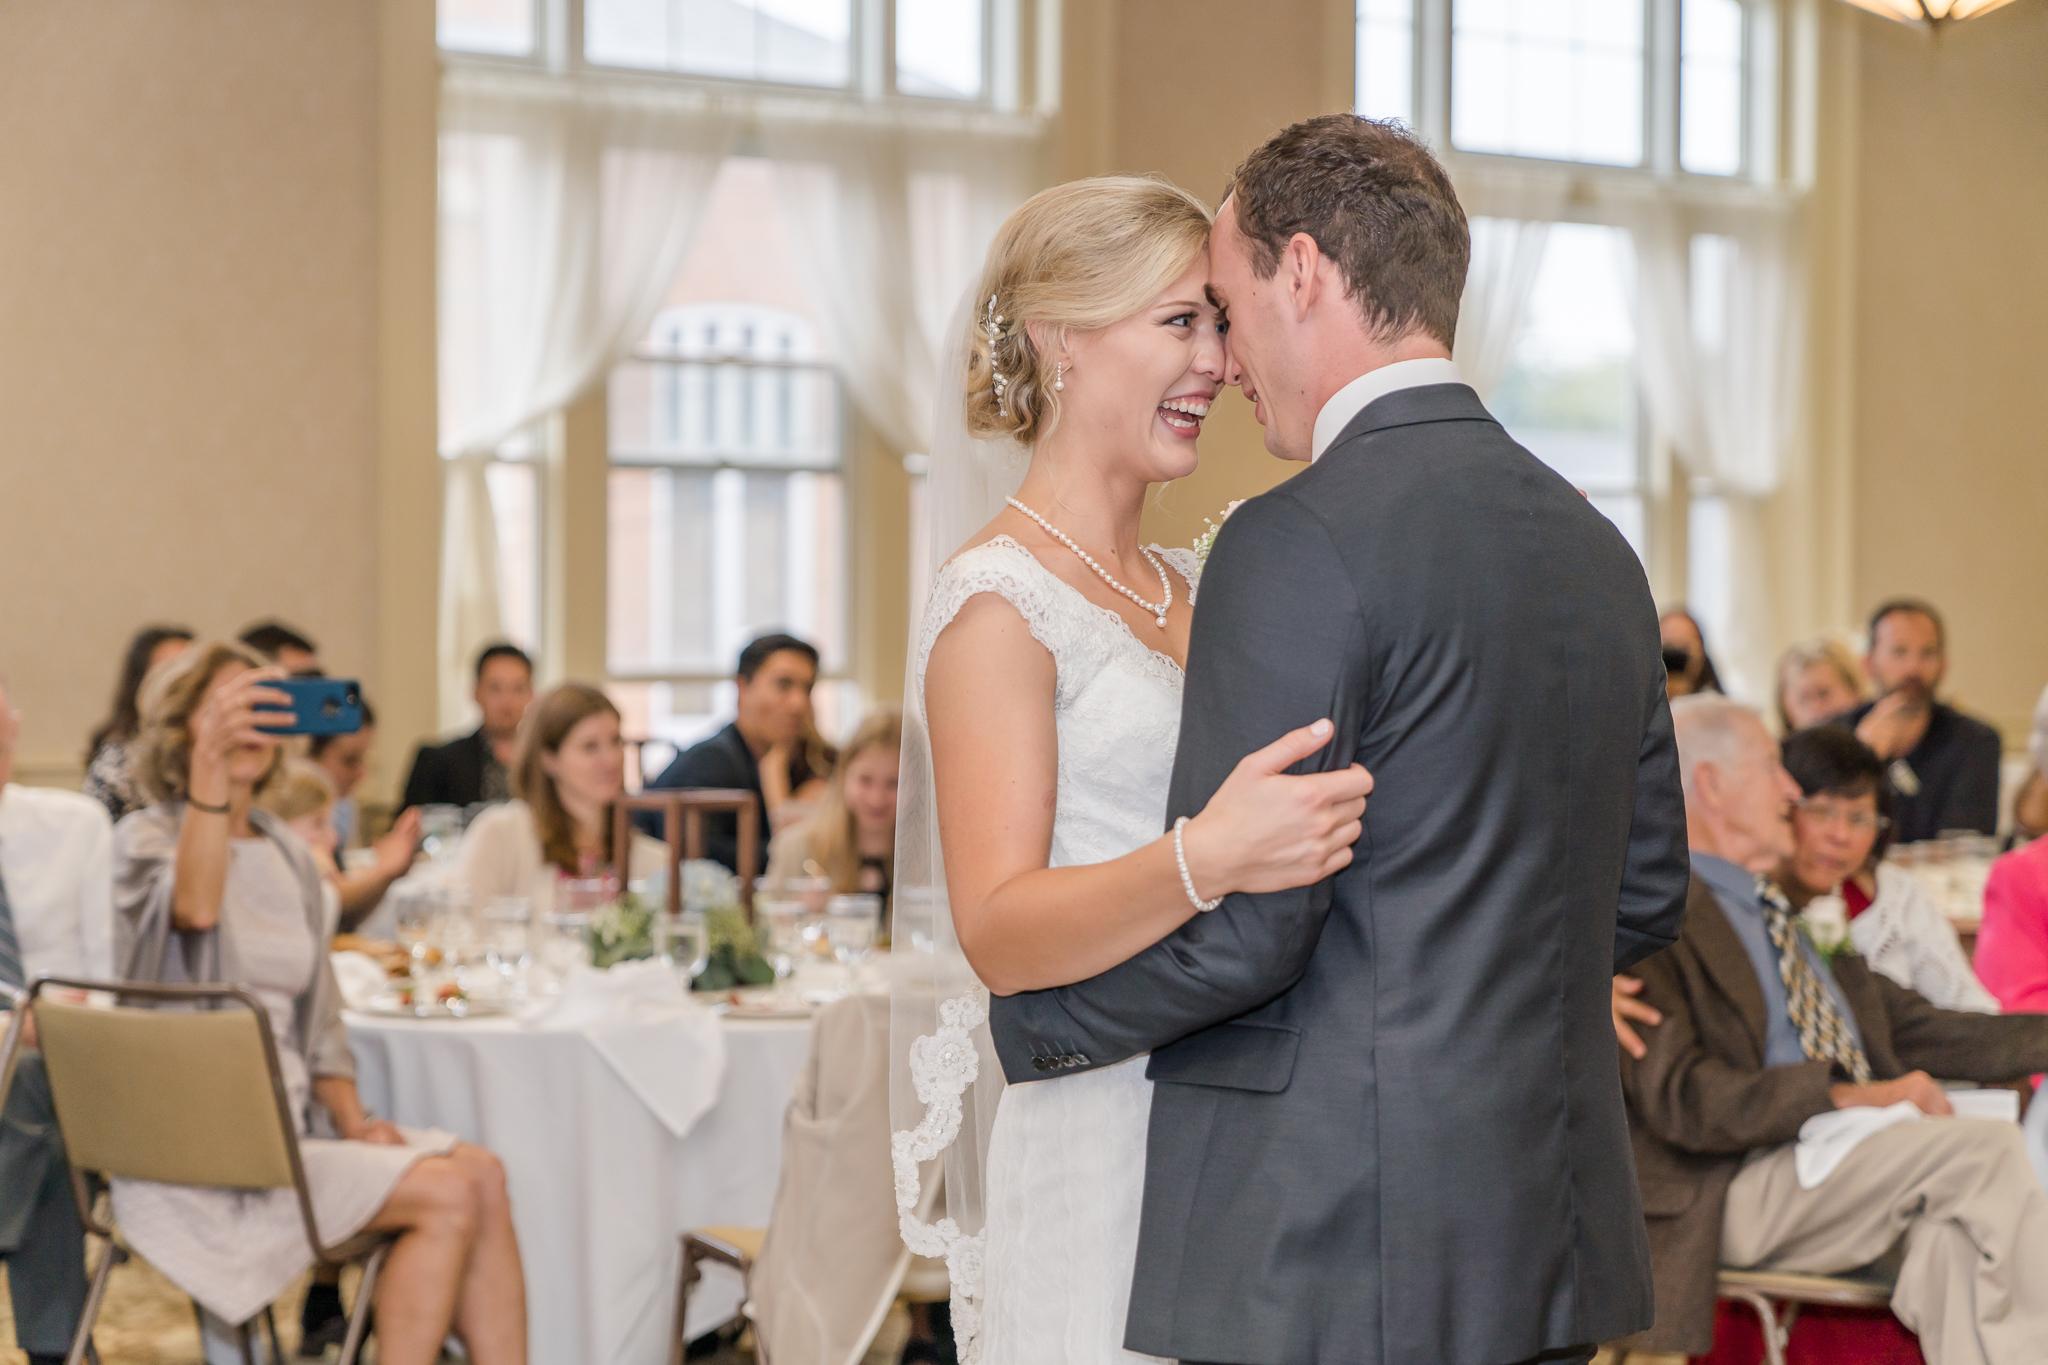 Westminister Hall Wedding Winona Lake Indiana07520.jpg